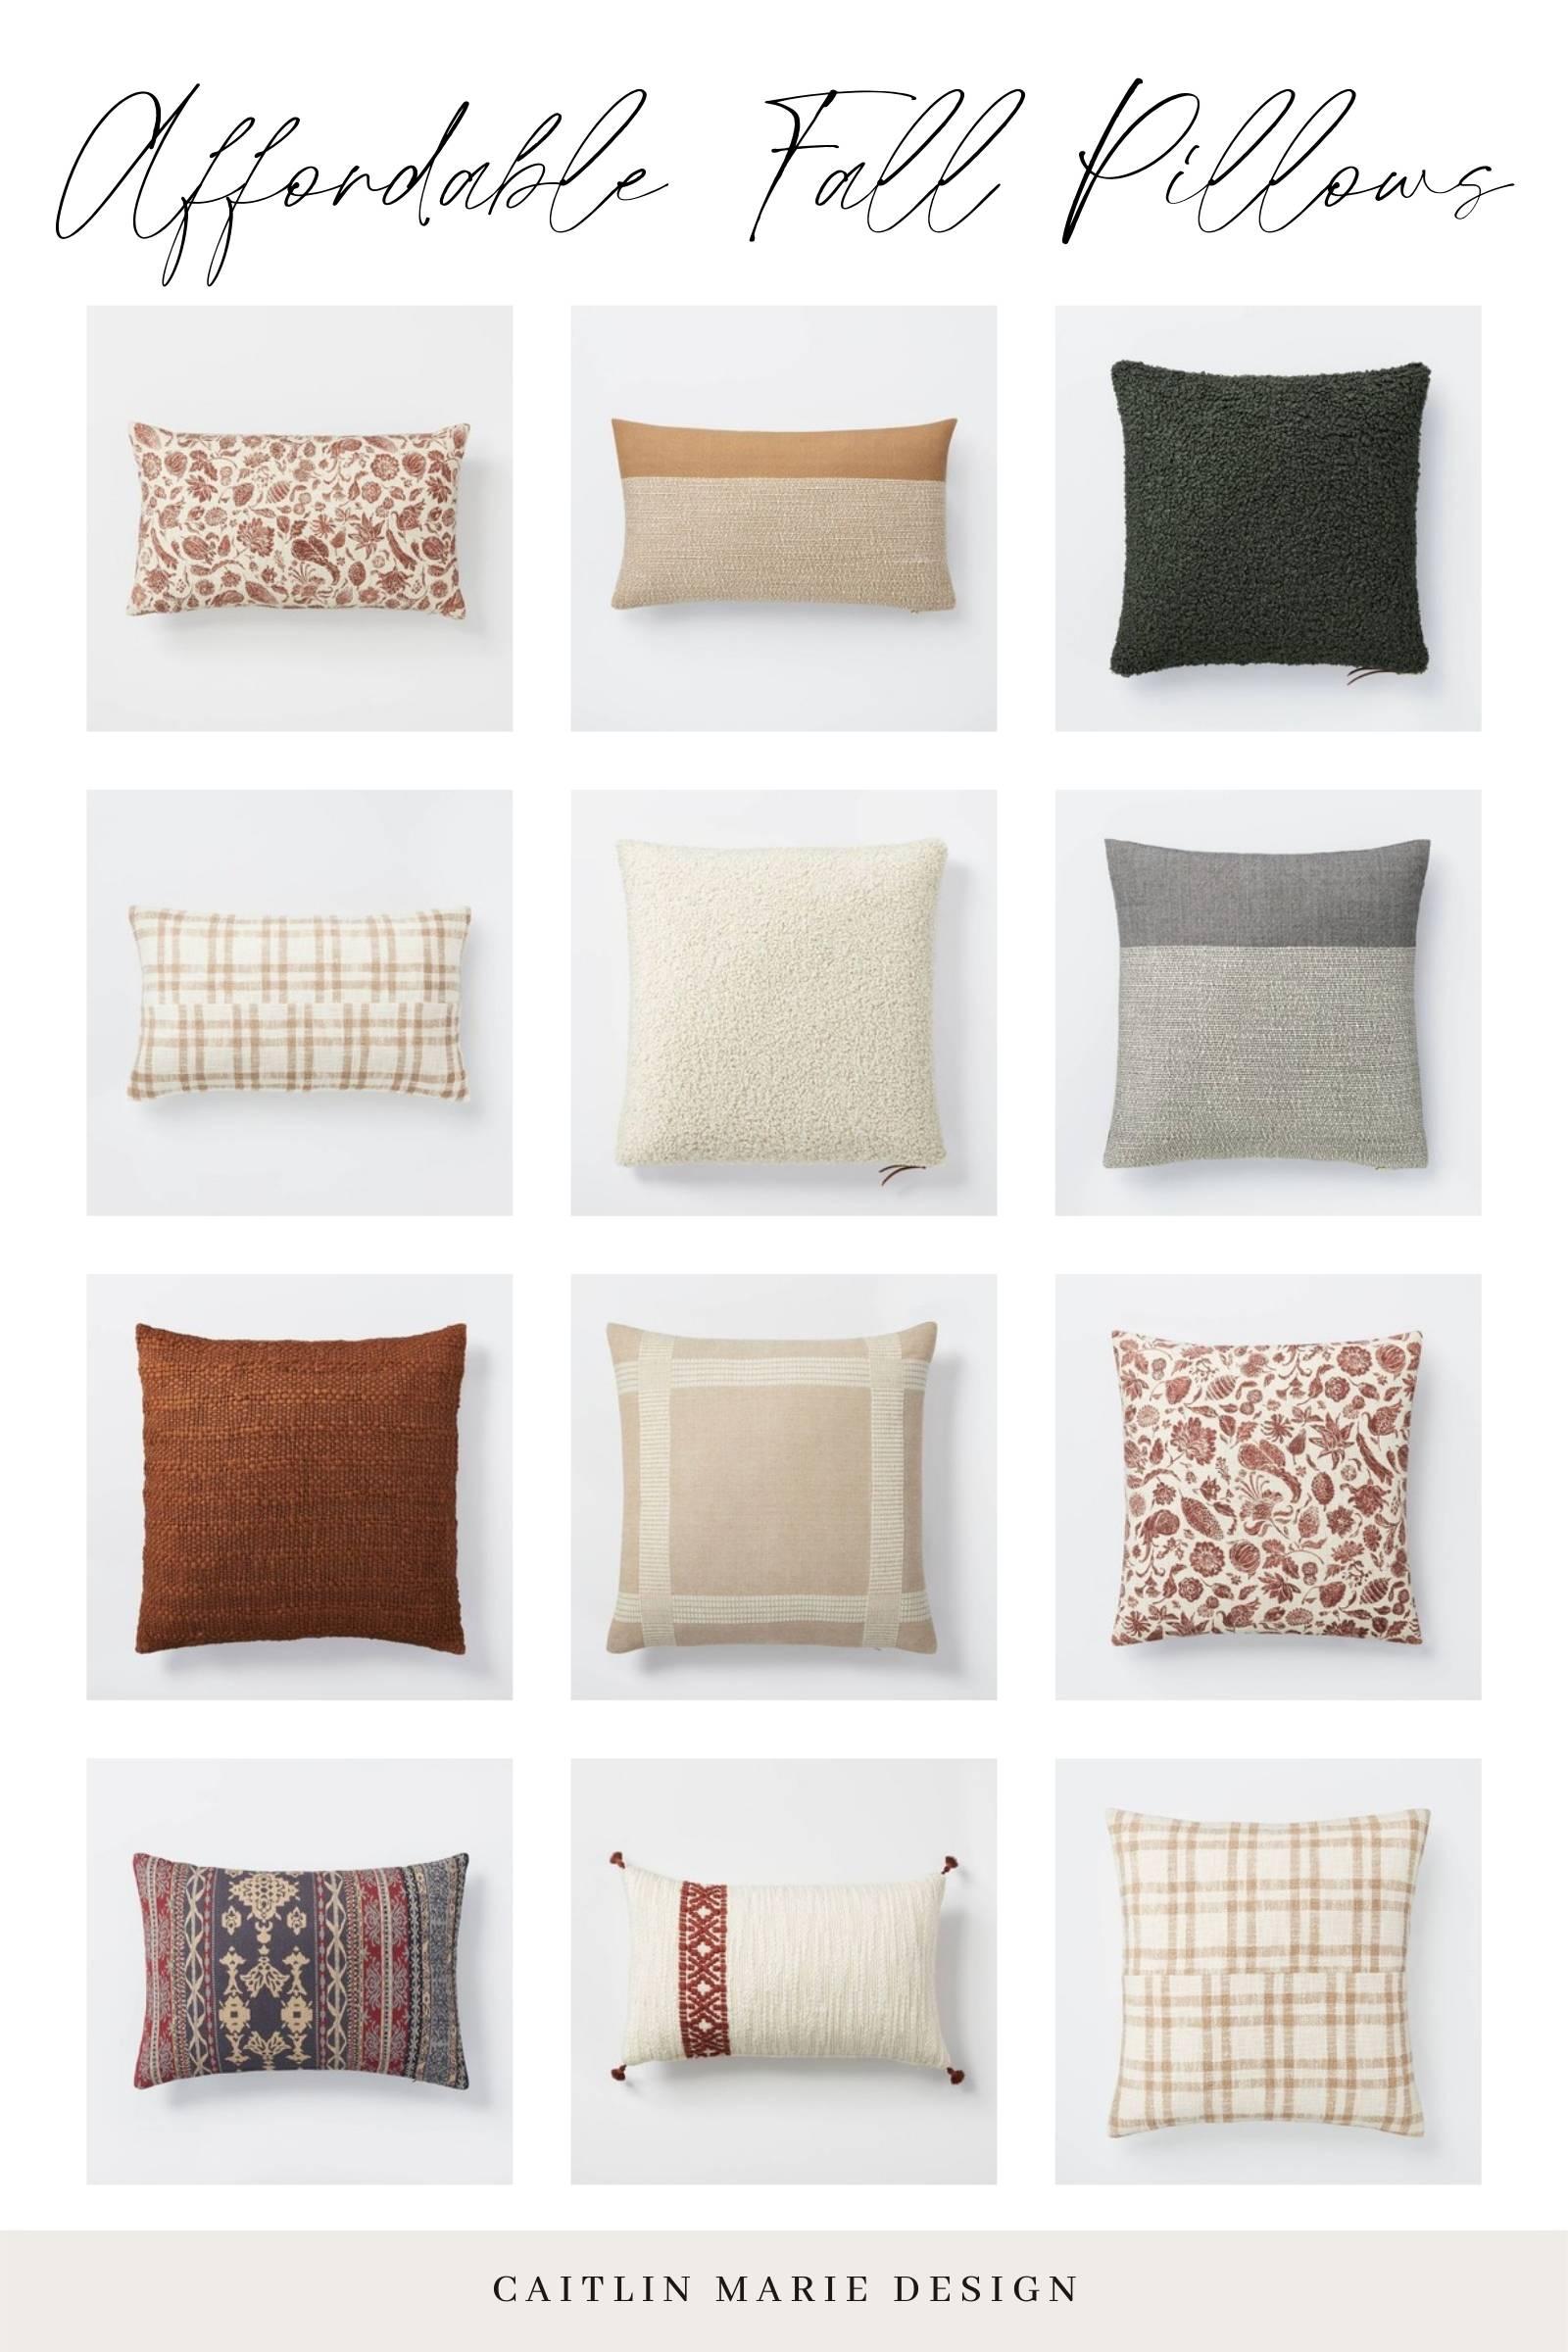 affordable fall pillows - Studio McGee fall decor